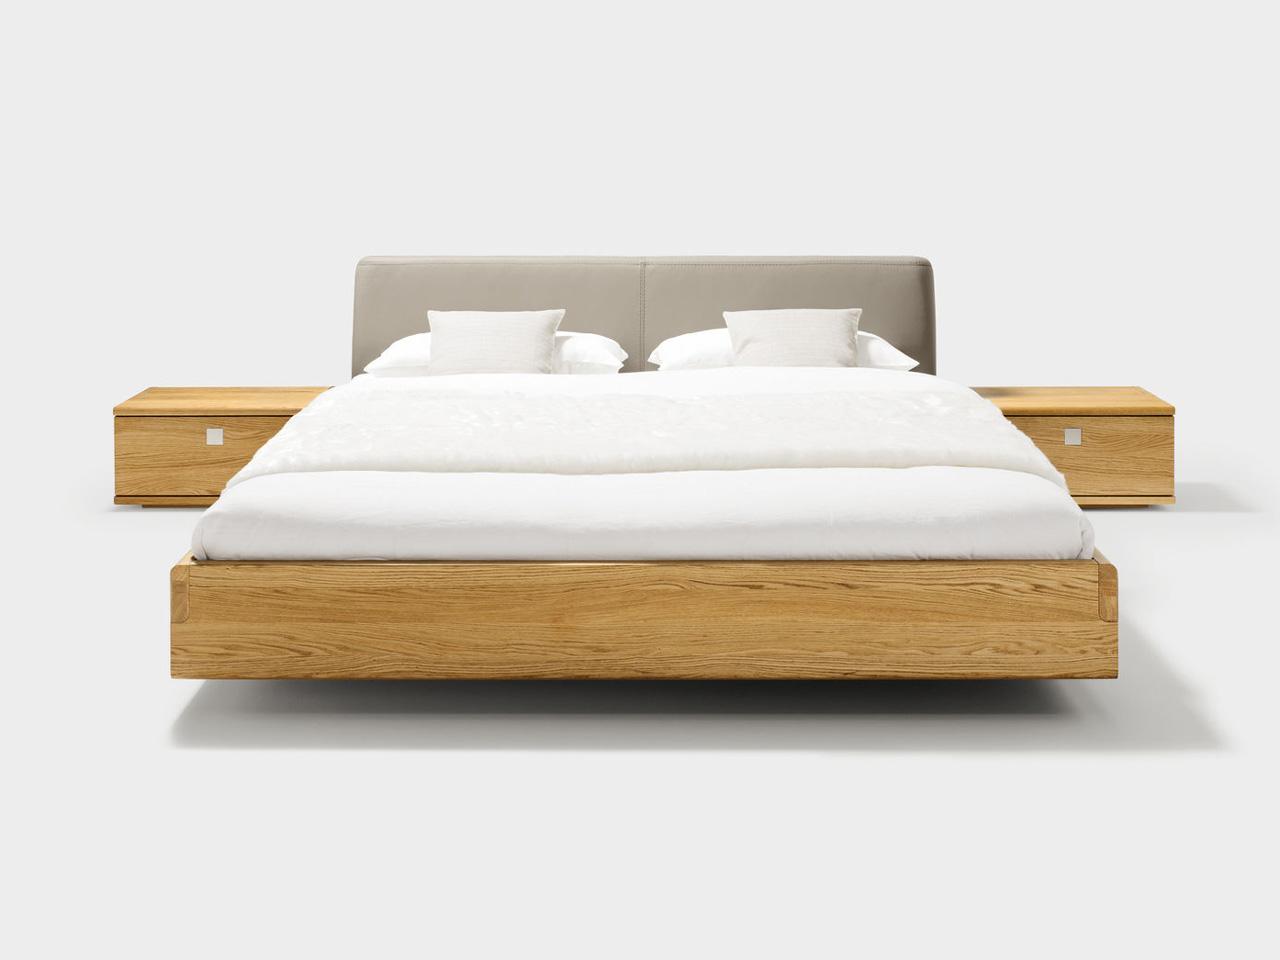 team 7 schlafzimmer wien. Black Bedroom Furniture Sets. Home Design Ideas